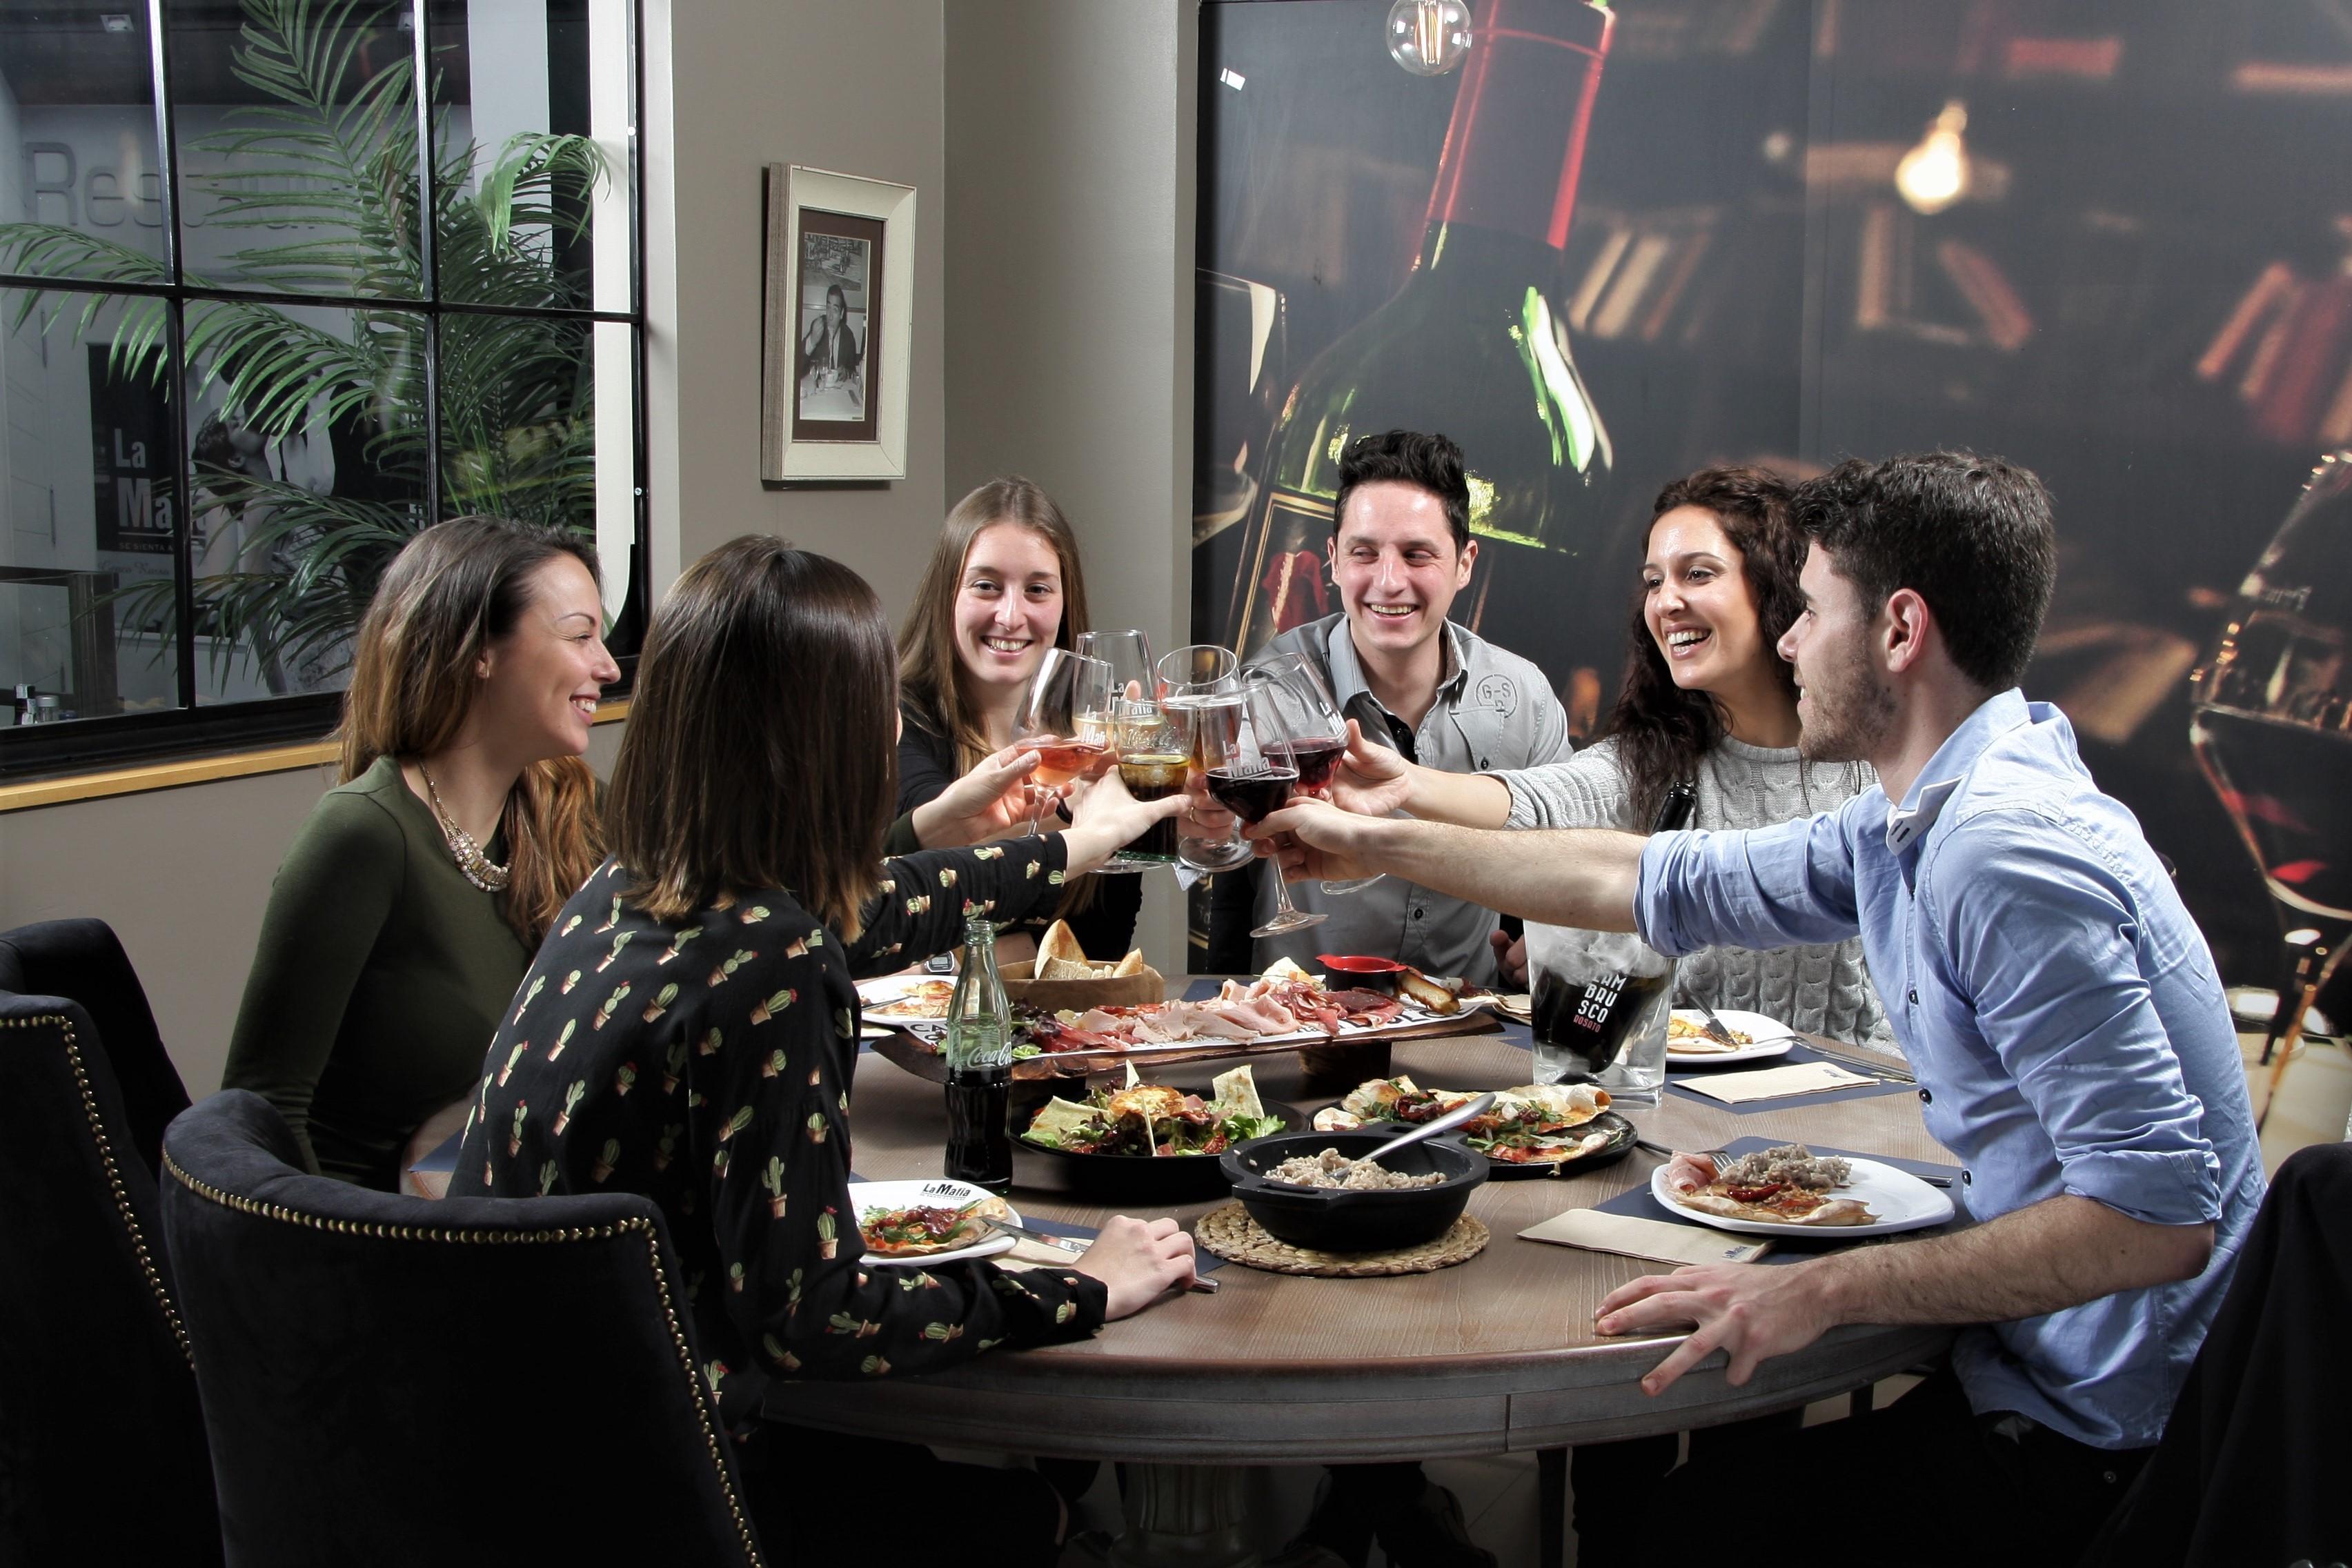 IMG 1434 - ¿Pensando ya en el final de carrera? La mejor cena, con 'La Mafia se sienta a la mesa'